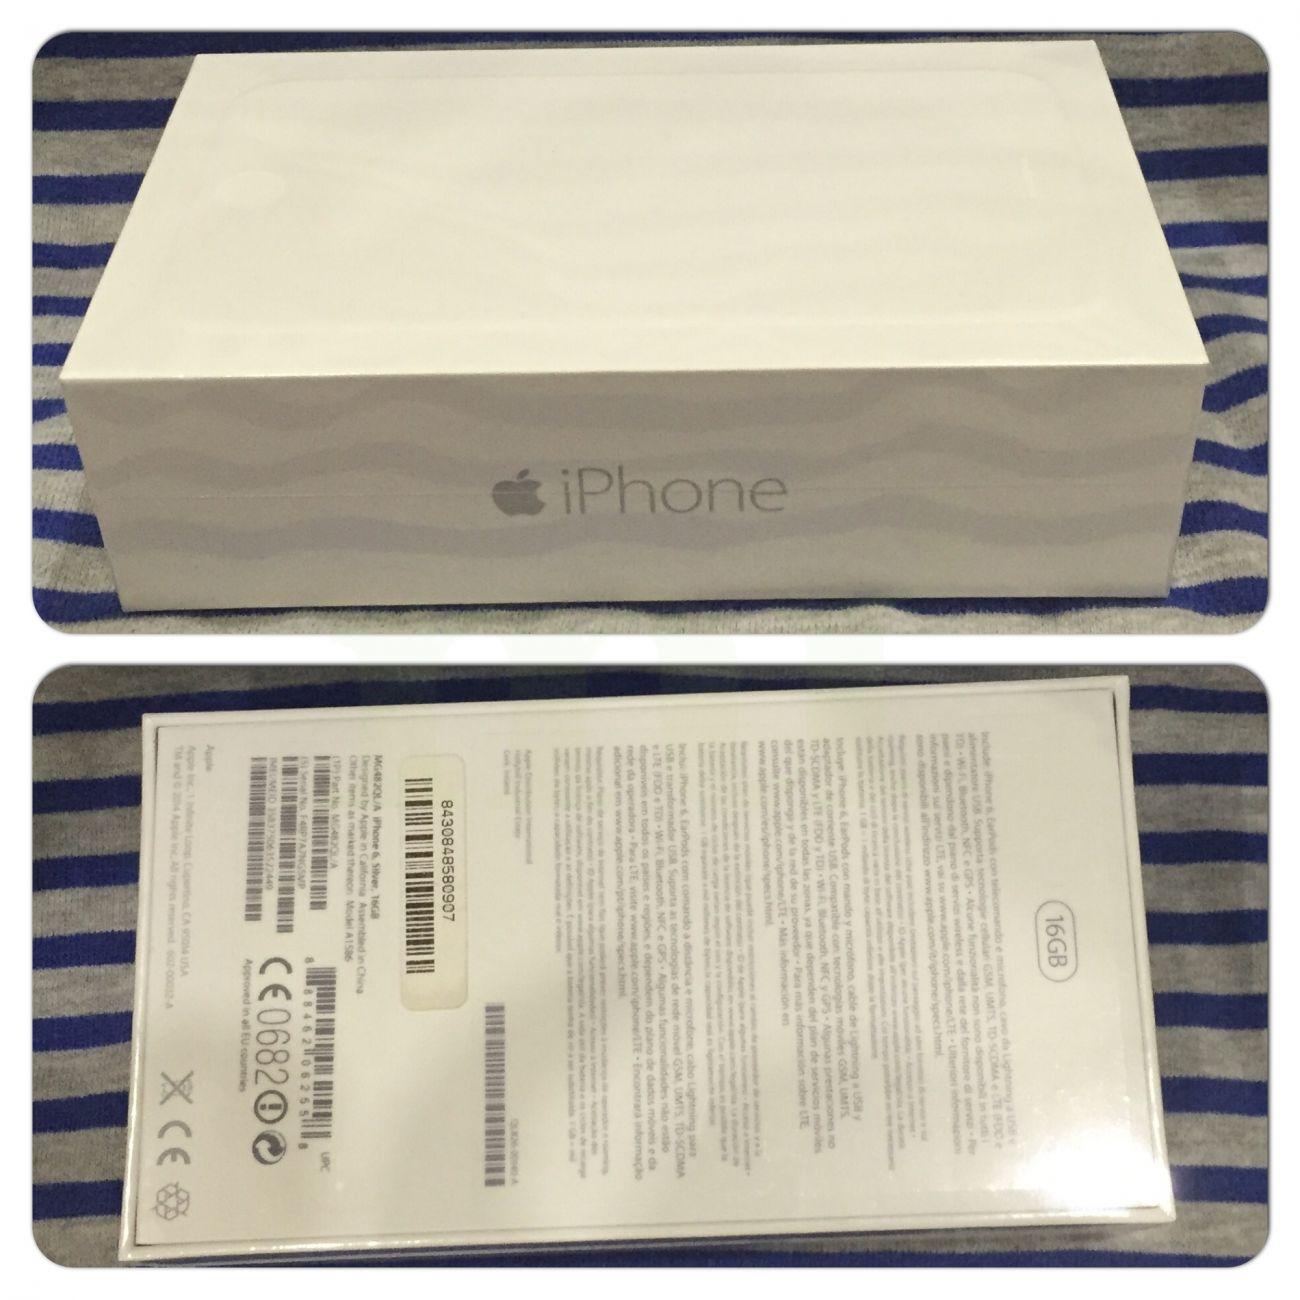 Find Iphone 16Gb i iPhone - 6 - Kb brugt p DBA Find Iphone 6 16Gb p DBA - kb og salg af nyt og brugt Find Iphone 6S 16Gb p DBA - kb og salg af nyt og brugt